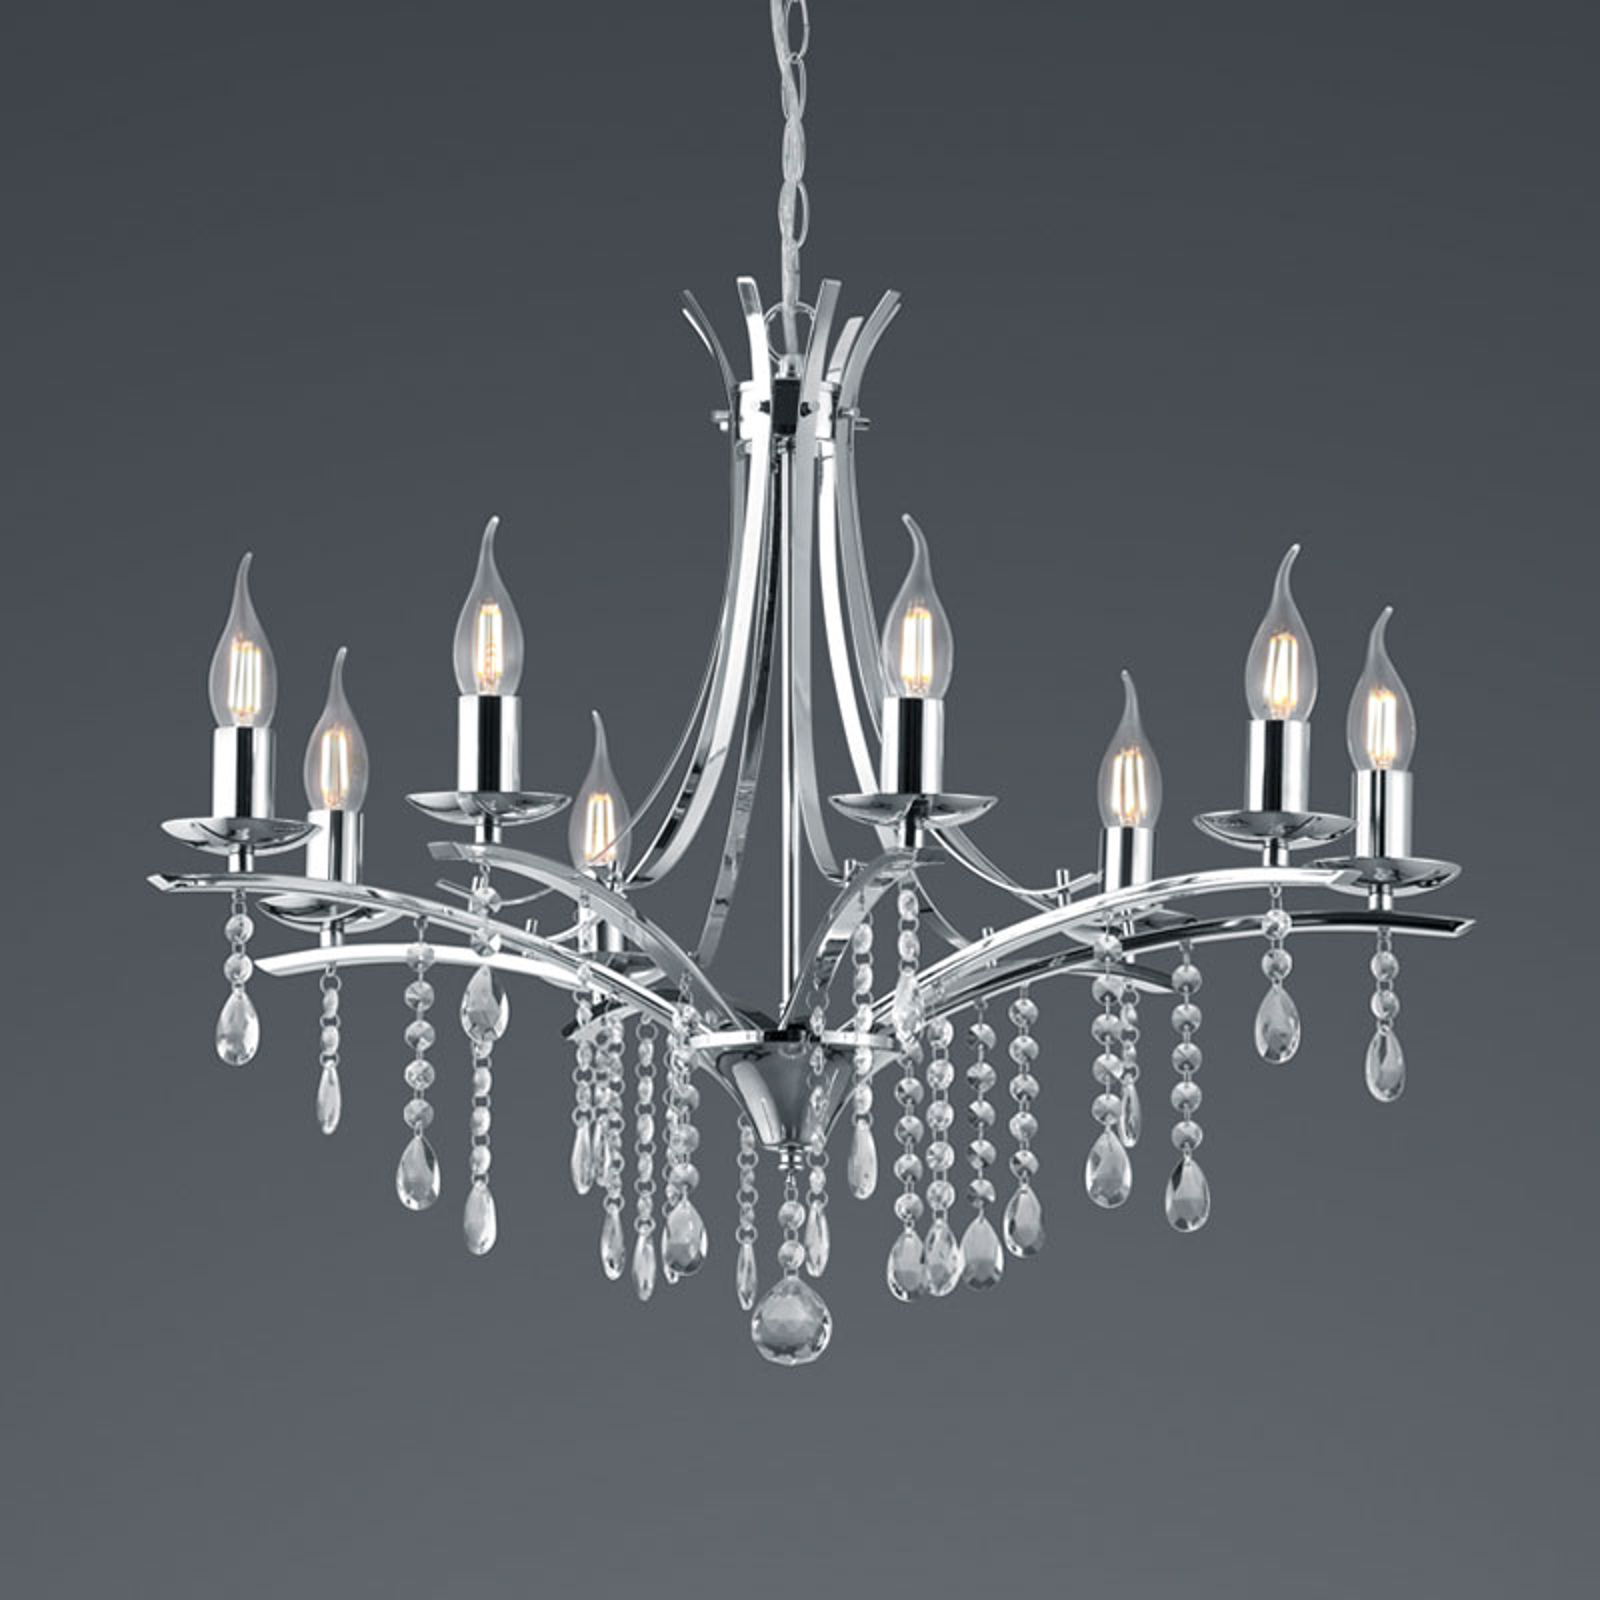 Kroonluchter Lucerna met glasbehang, 8-lamps